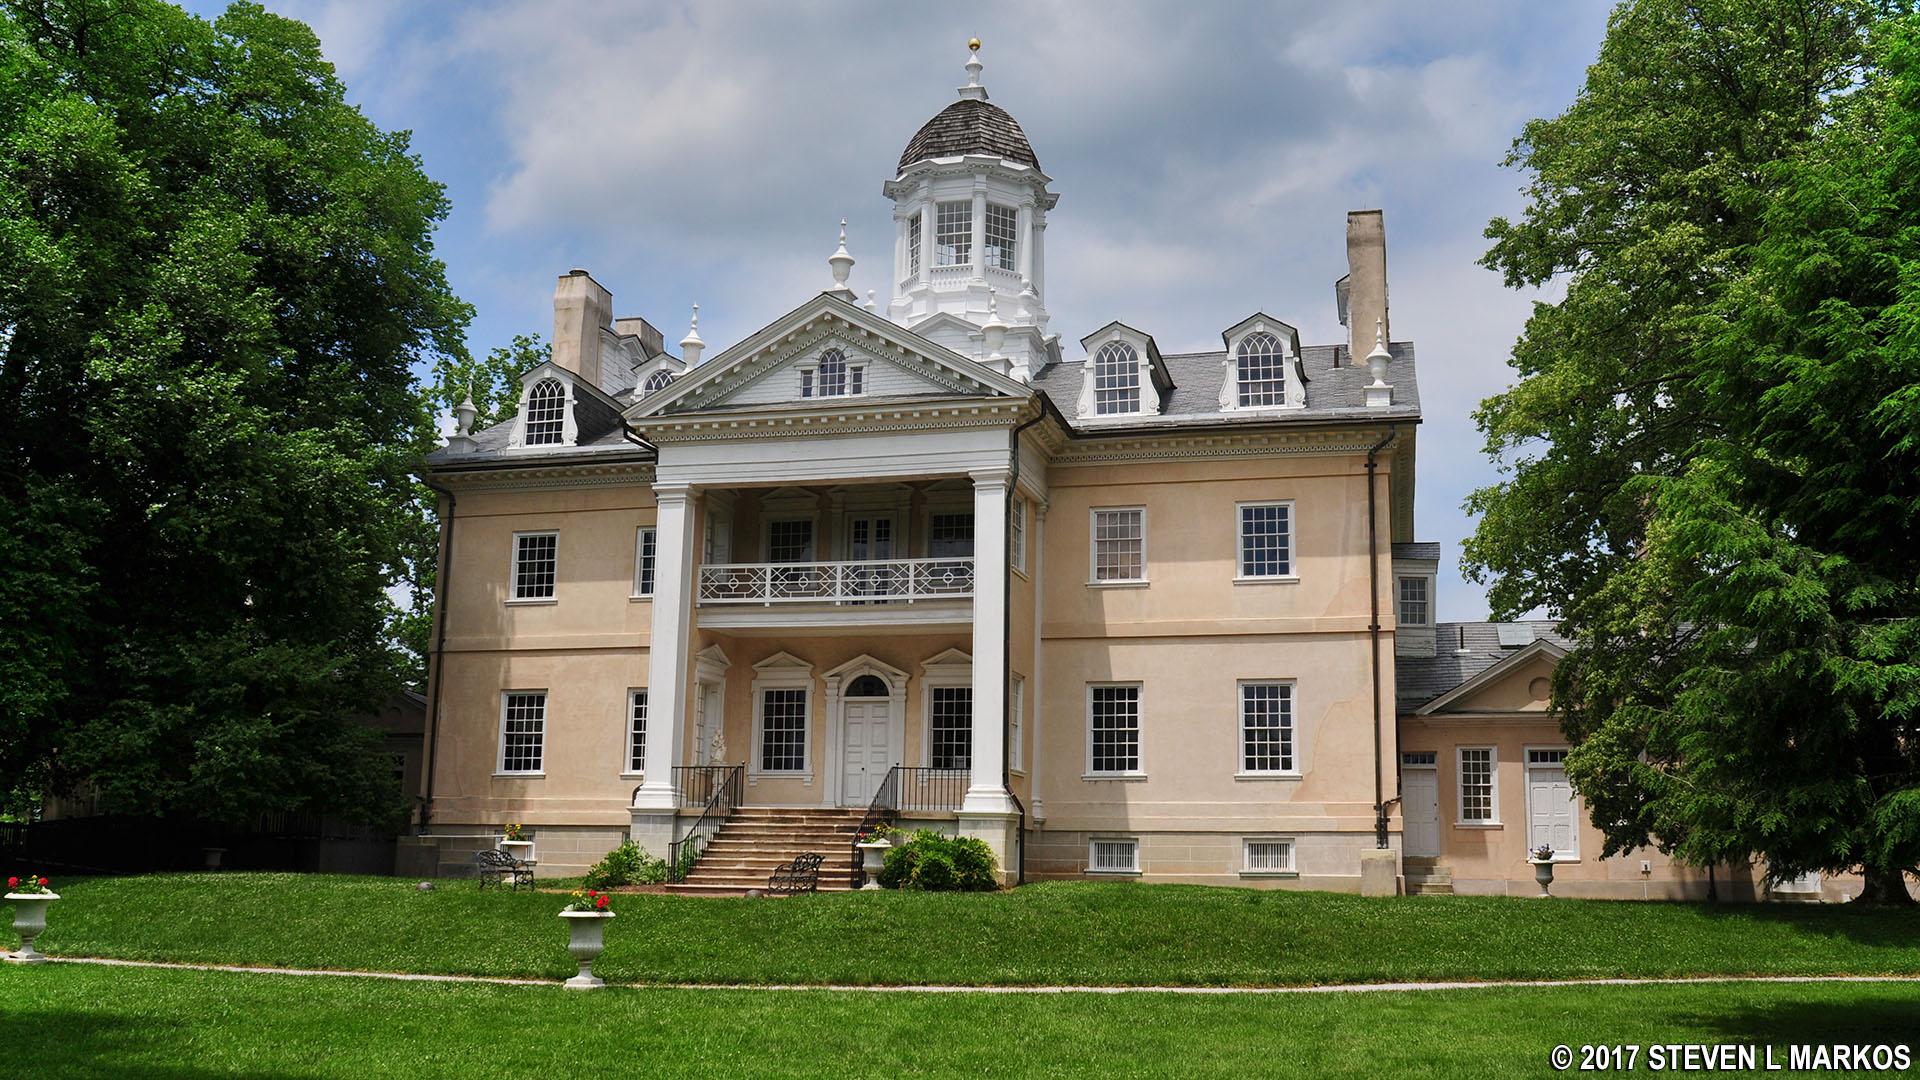 Hampton national historic site - Hampton Mansion